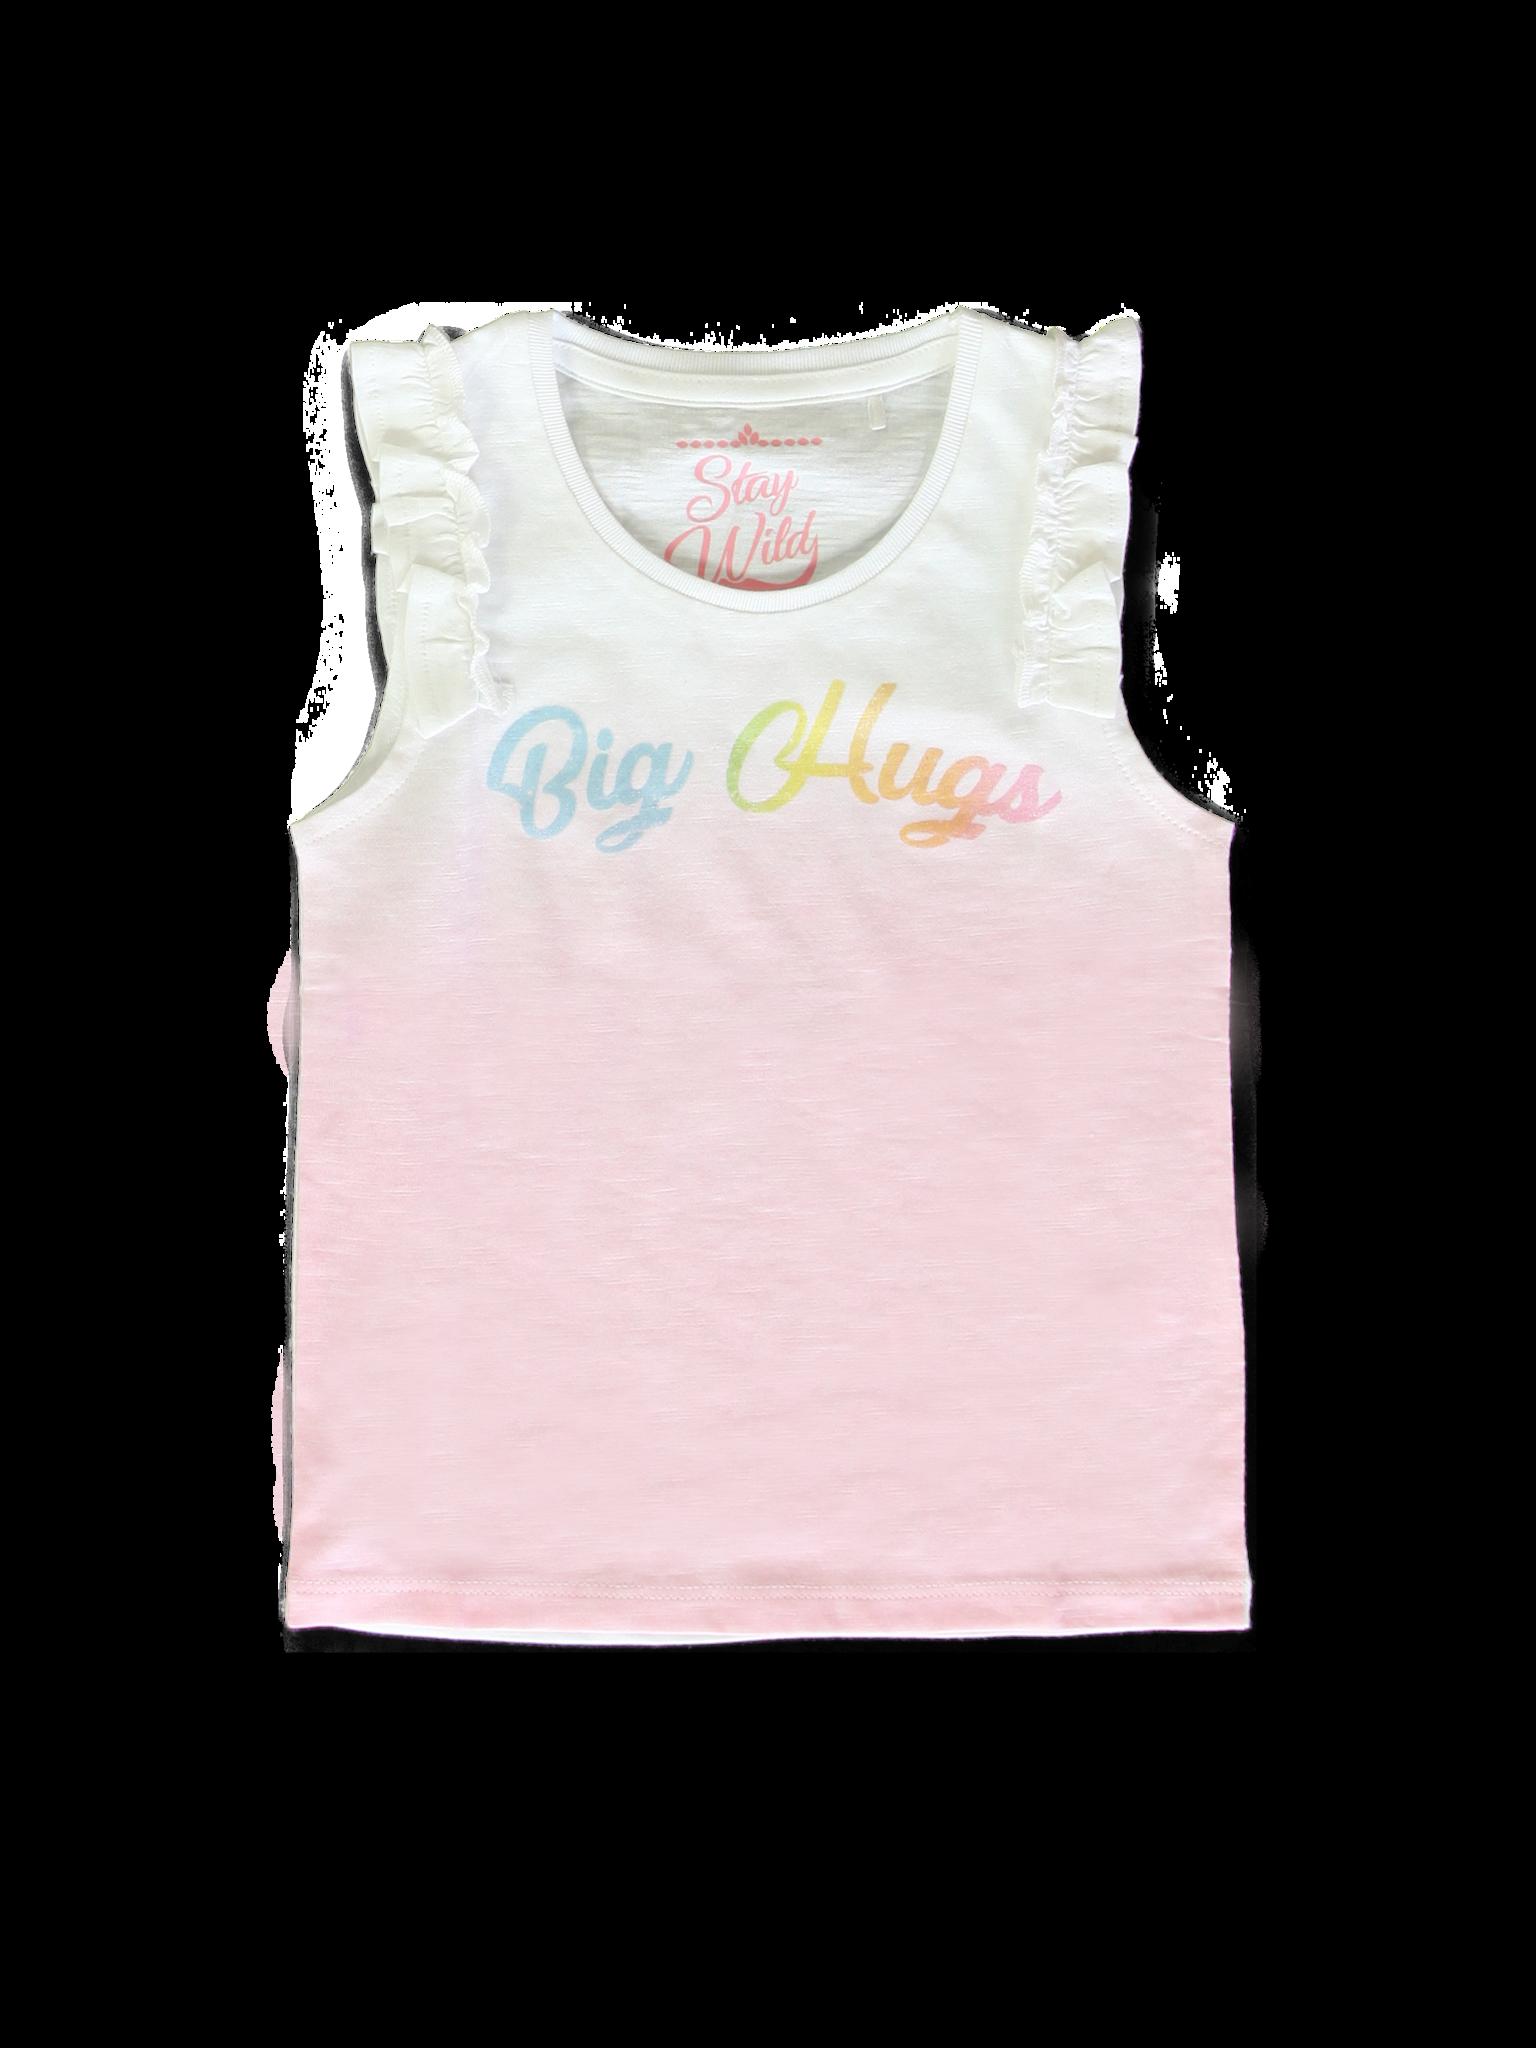 All Brands   Summerproducts Small Girls   Singlet   12 pcs/box